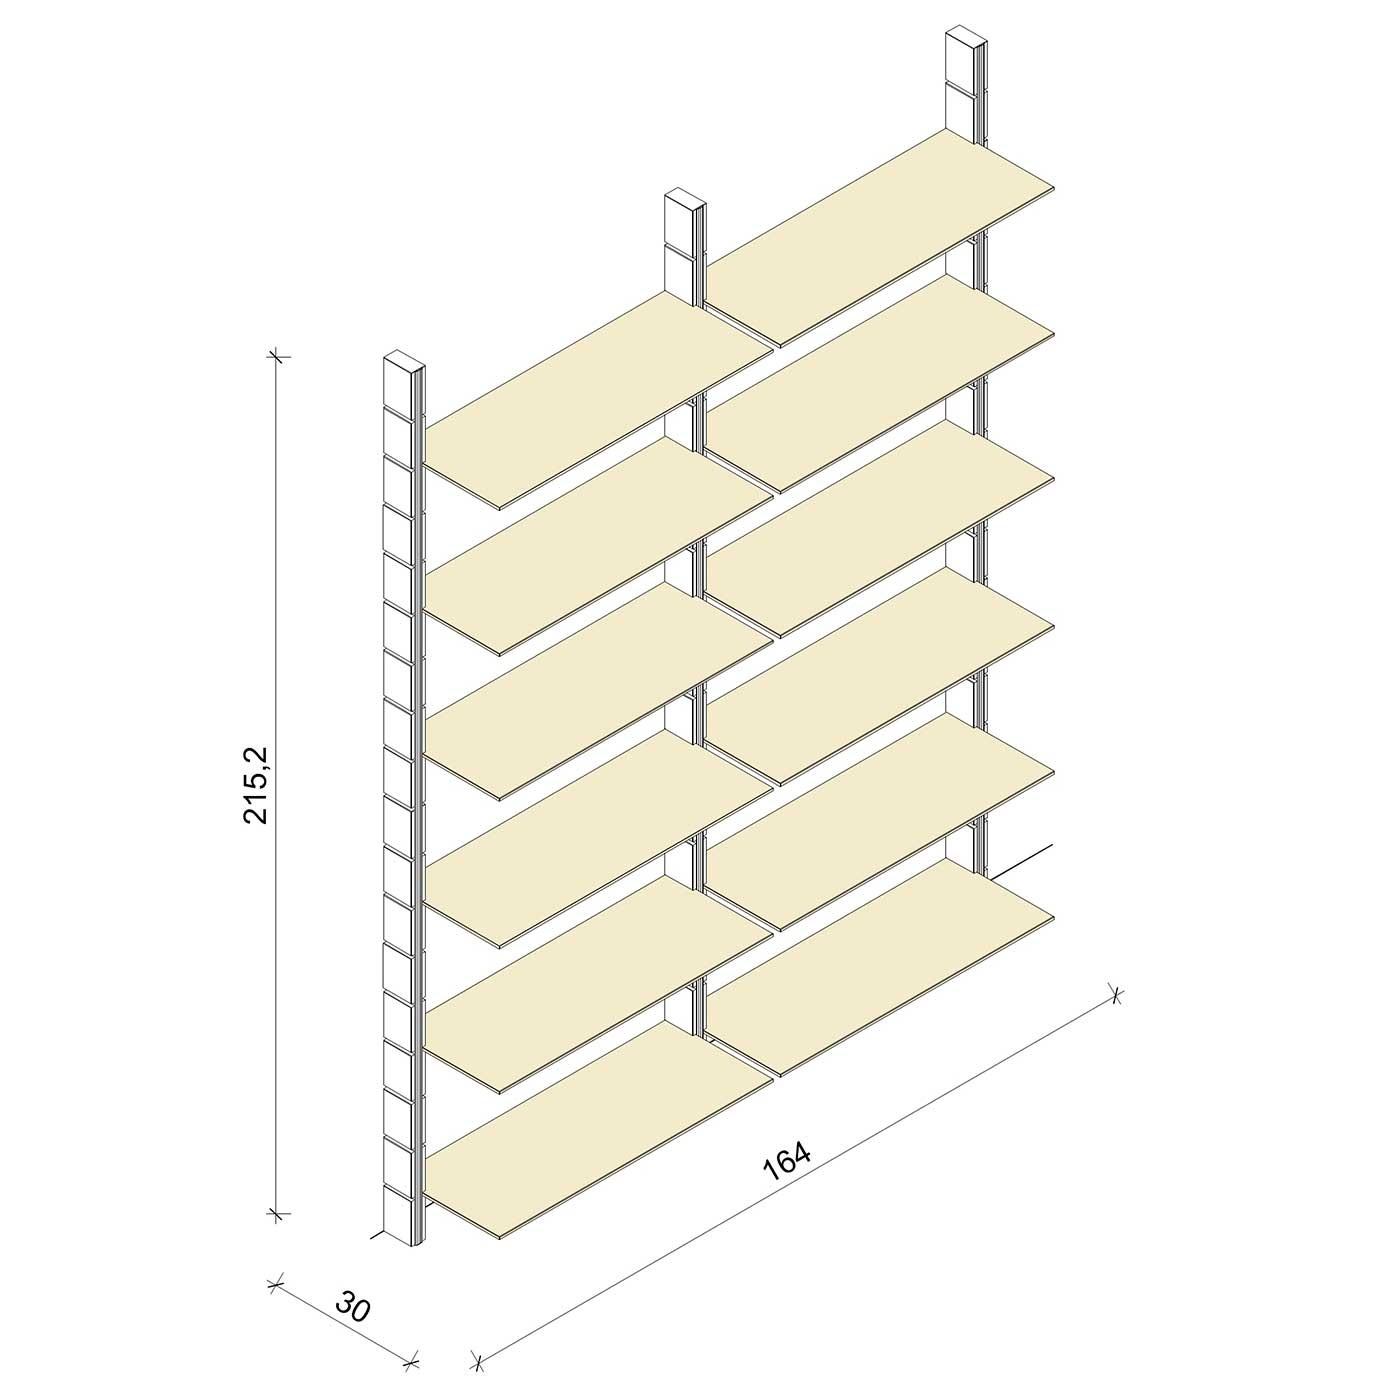 Bücherregal - Prime (XL) 164 - Maß: 164 x 215,2 x 30 cm (B x H x T)